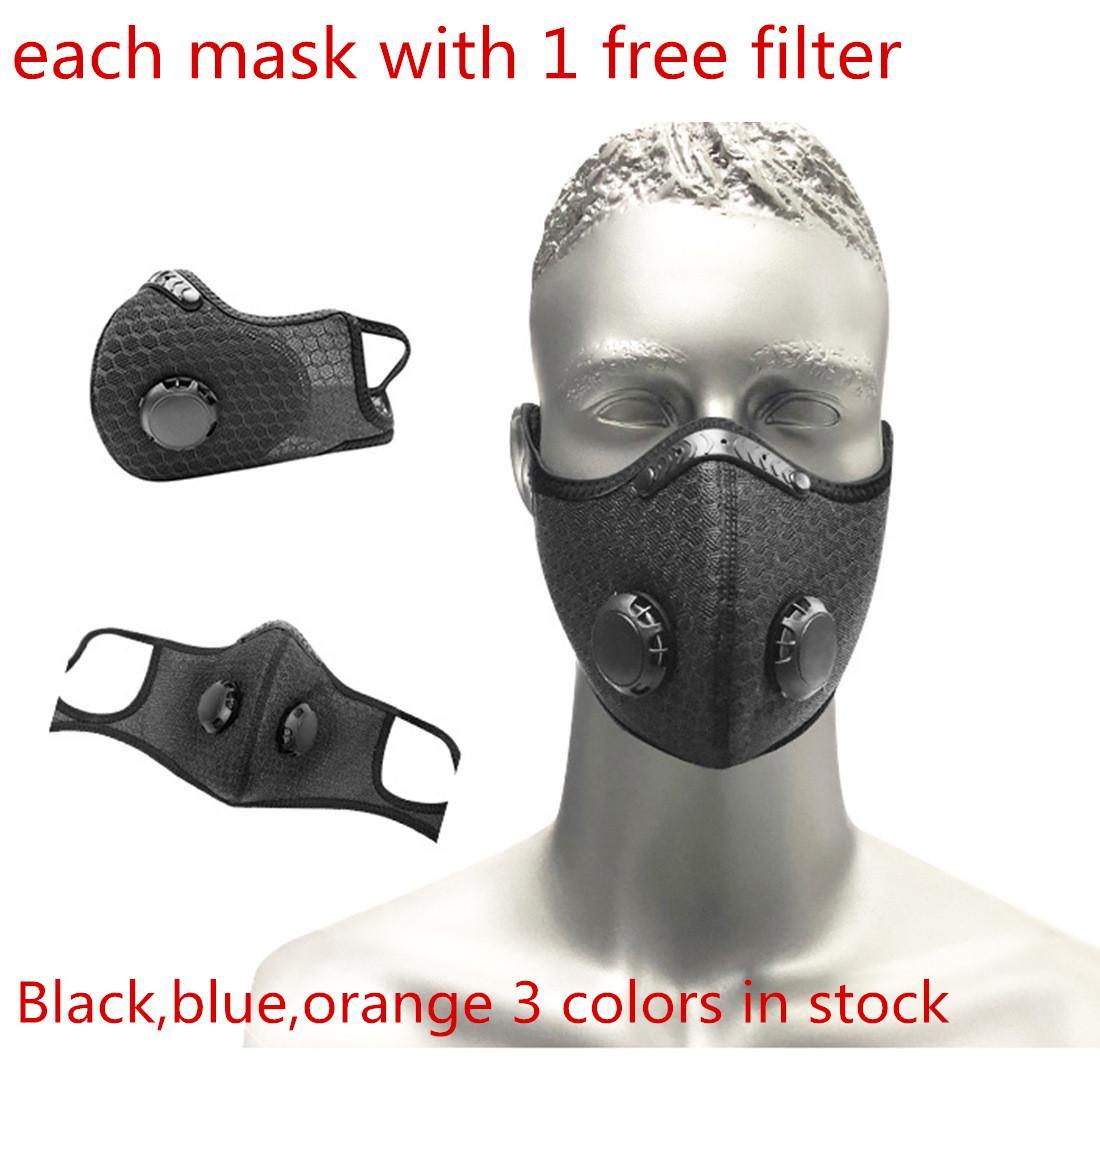 Máscara de deporte cara con filtro de carbón PM 2.5 Anti polución a prueba de polvo Máscara Deporte de Ciclismo de mascarillas